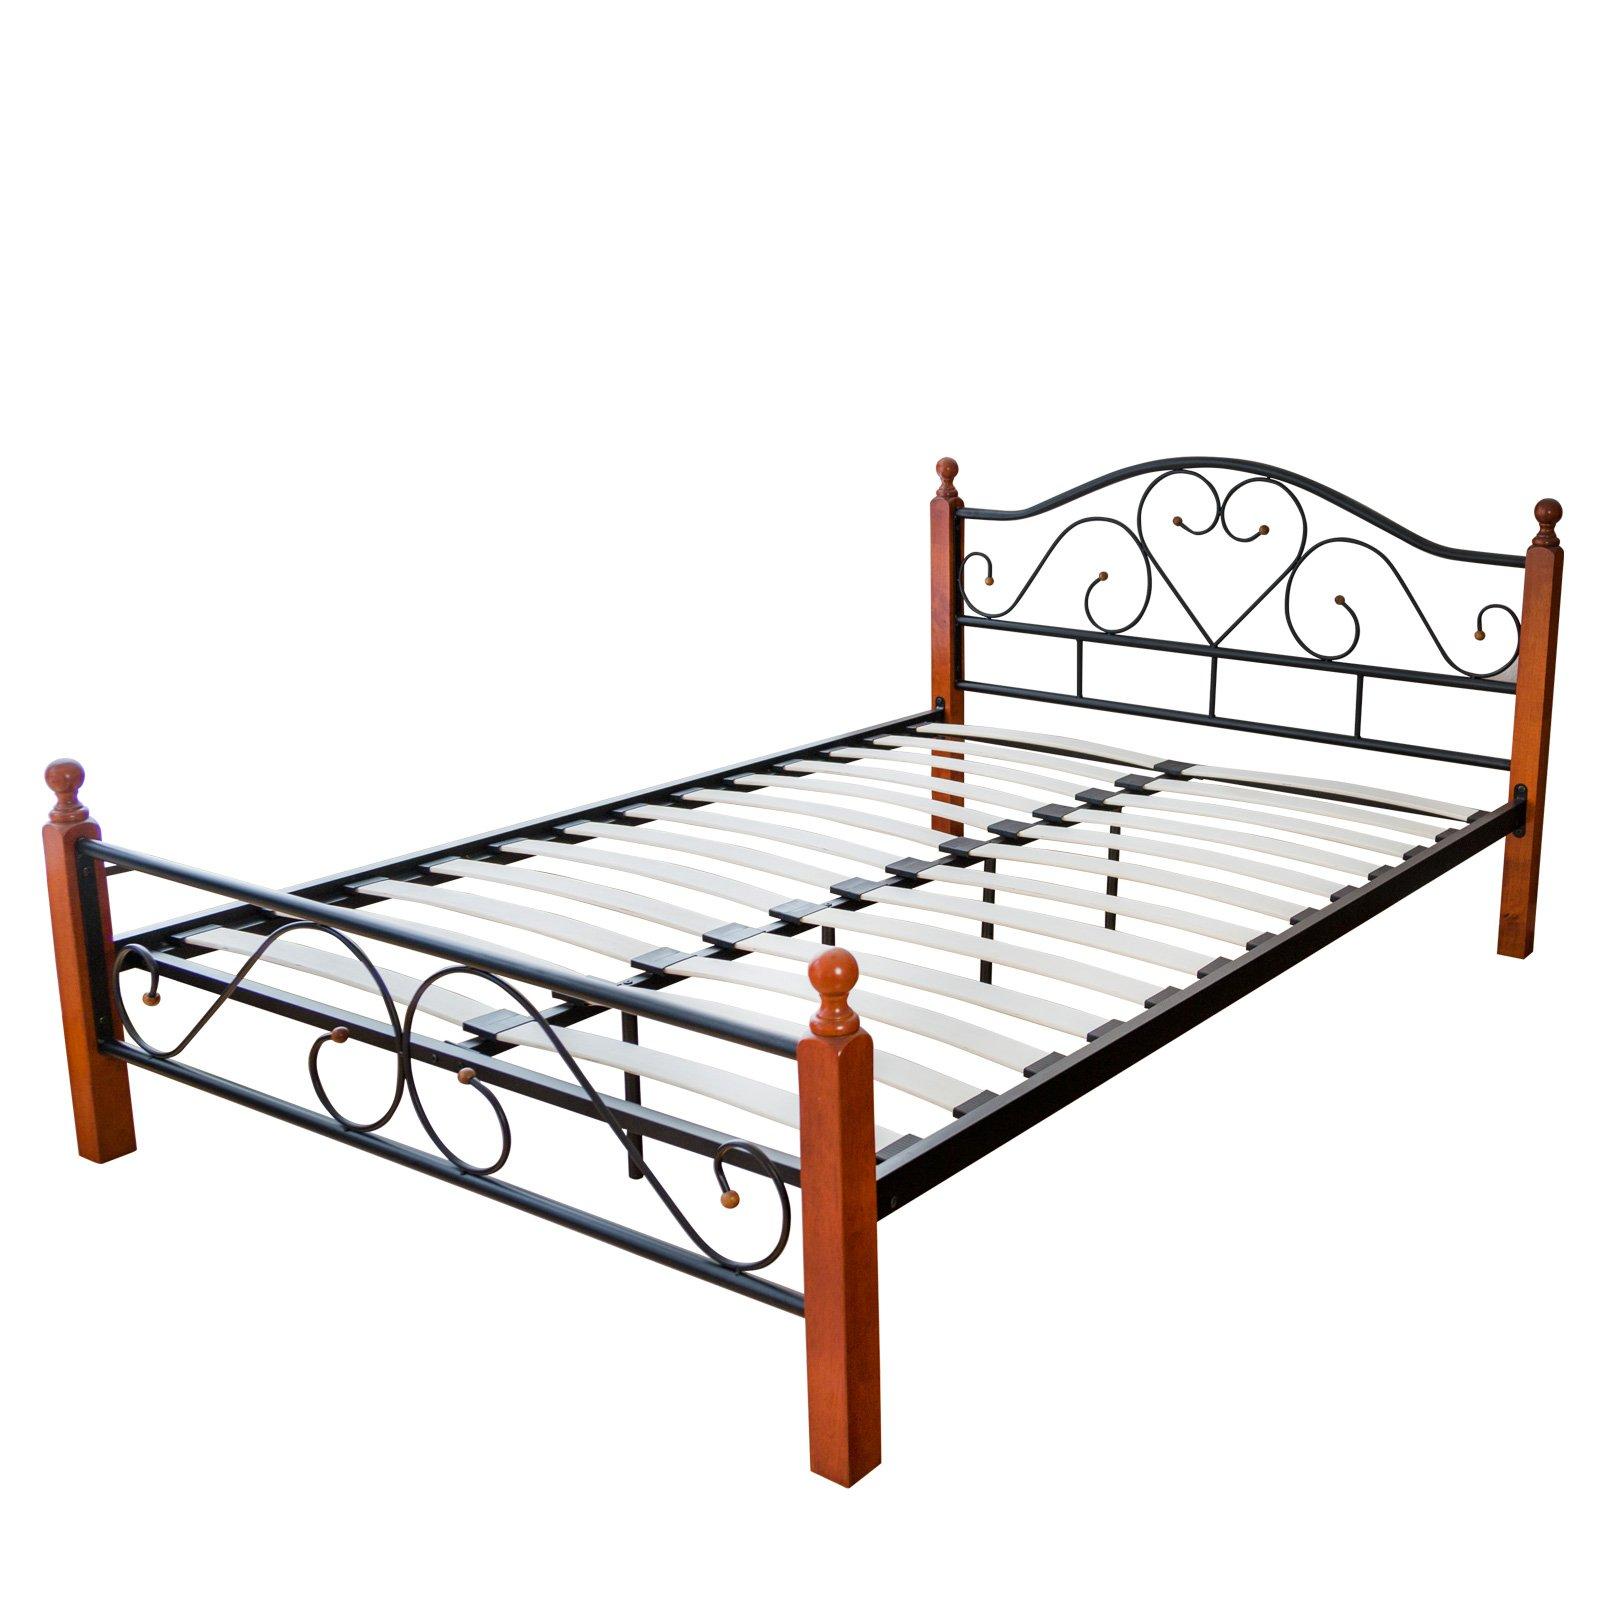 Full Size of Metall Bett Am Besten Bewertete Produkte In Der Kategorie Metallbetten Amazonde Kinder Betten Massiv Rustikales Bette Starlet Duschwanne King Size Bambus Weiß Bett Metall Bett